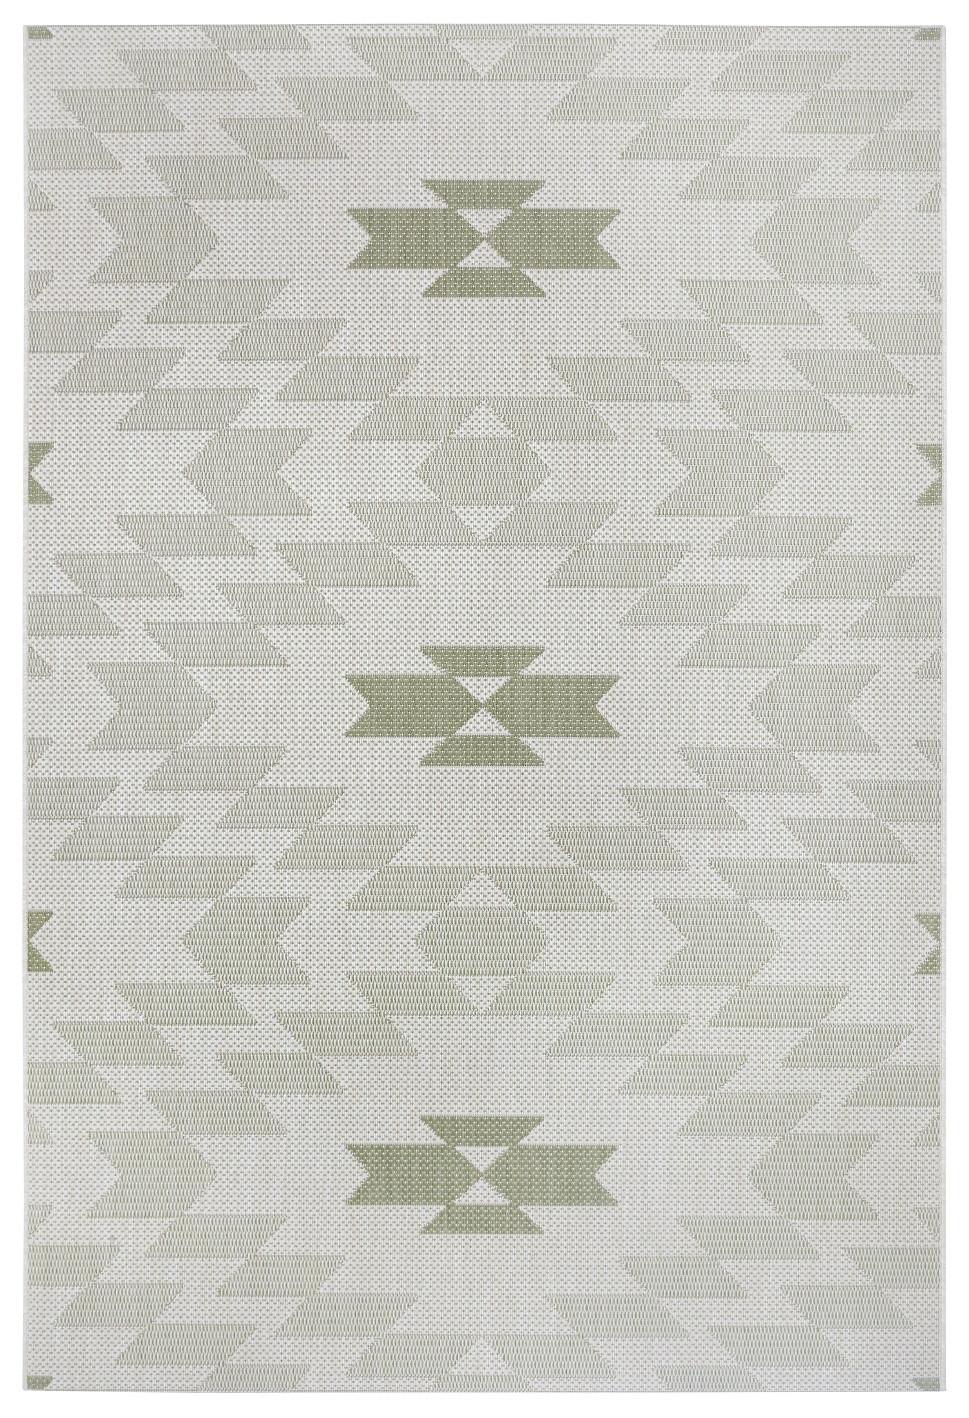 Hanse Home Collection koberce AKCE: 120x170 cm Kusový koberec Flatweave 104870 Cream/Green - 120x170 cm